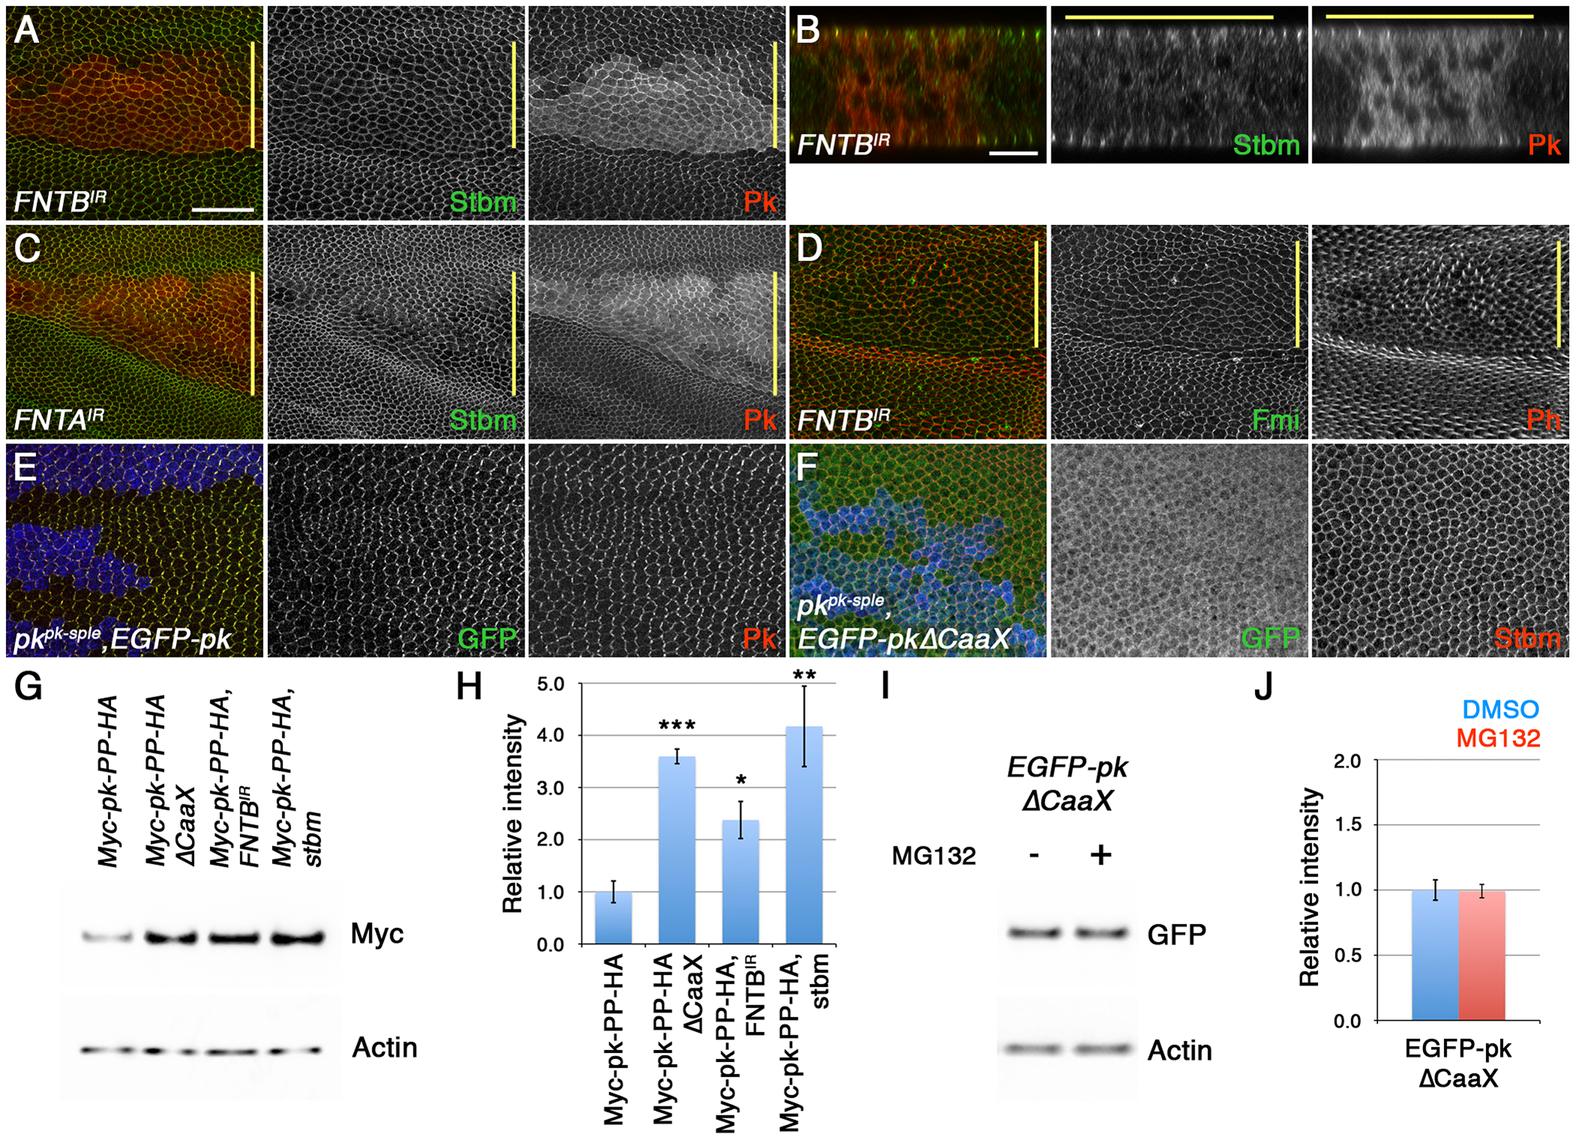 Loss of farnesylation causes an increase in cytoplasmic Pk.